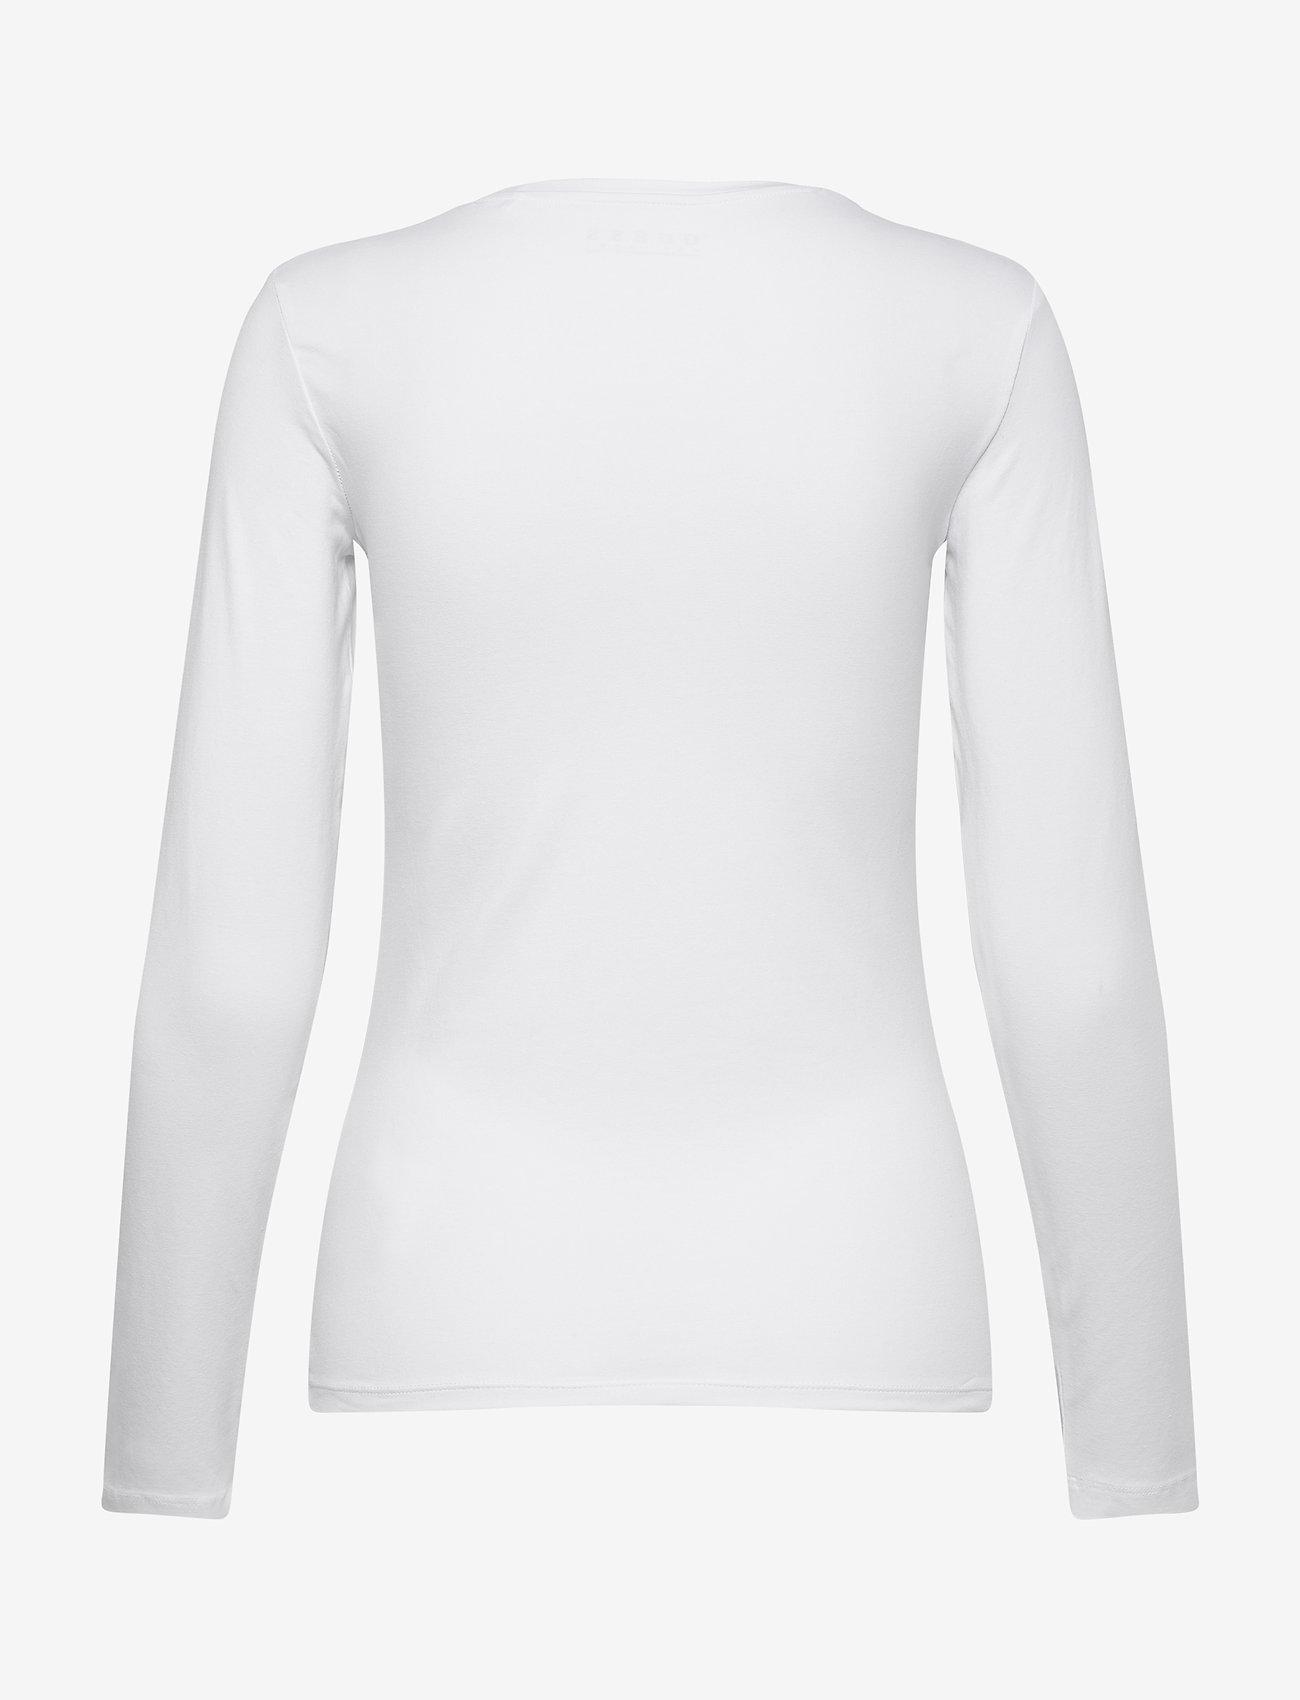 GUESS Jeans LS CN VILMA TEE - T-shirts & topper TRUE WHITE A000 - Dameklær Spesialtilbud